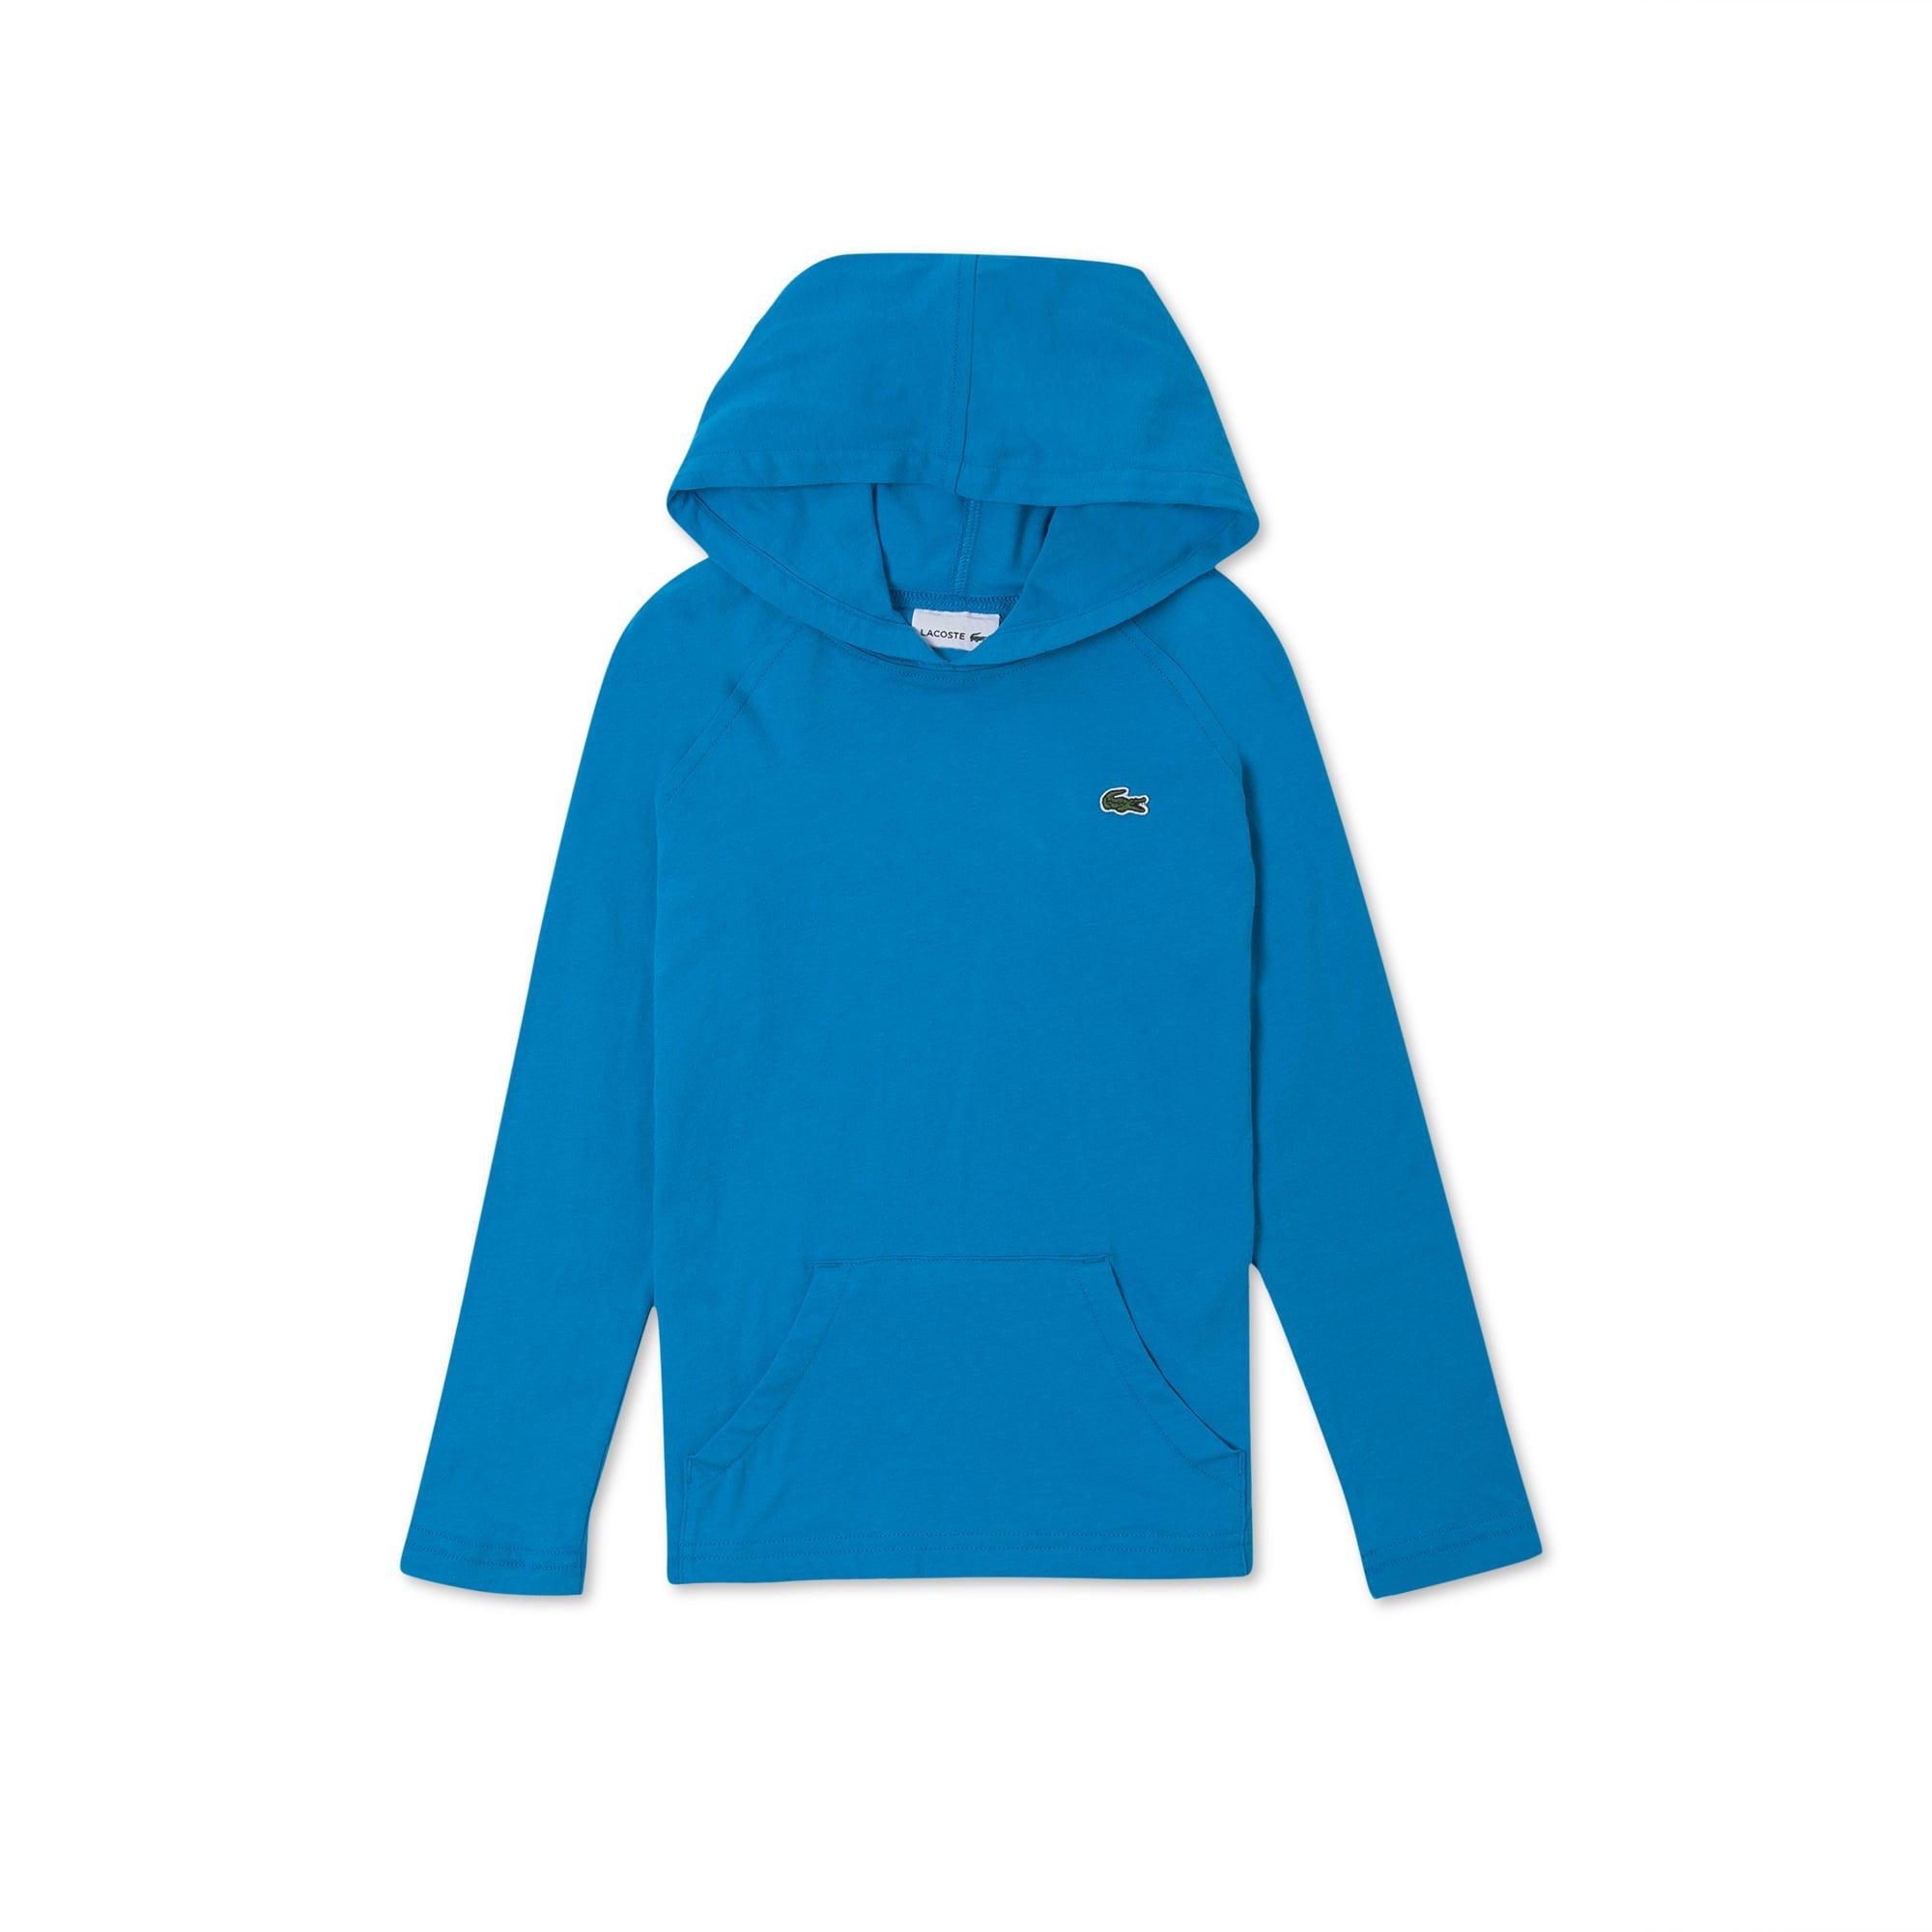 Boys' Hooded Cotton Jersey Sweatshirt